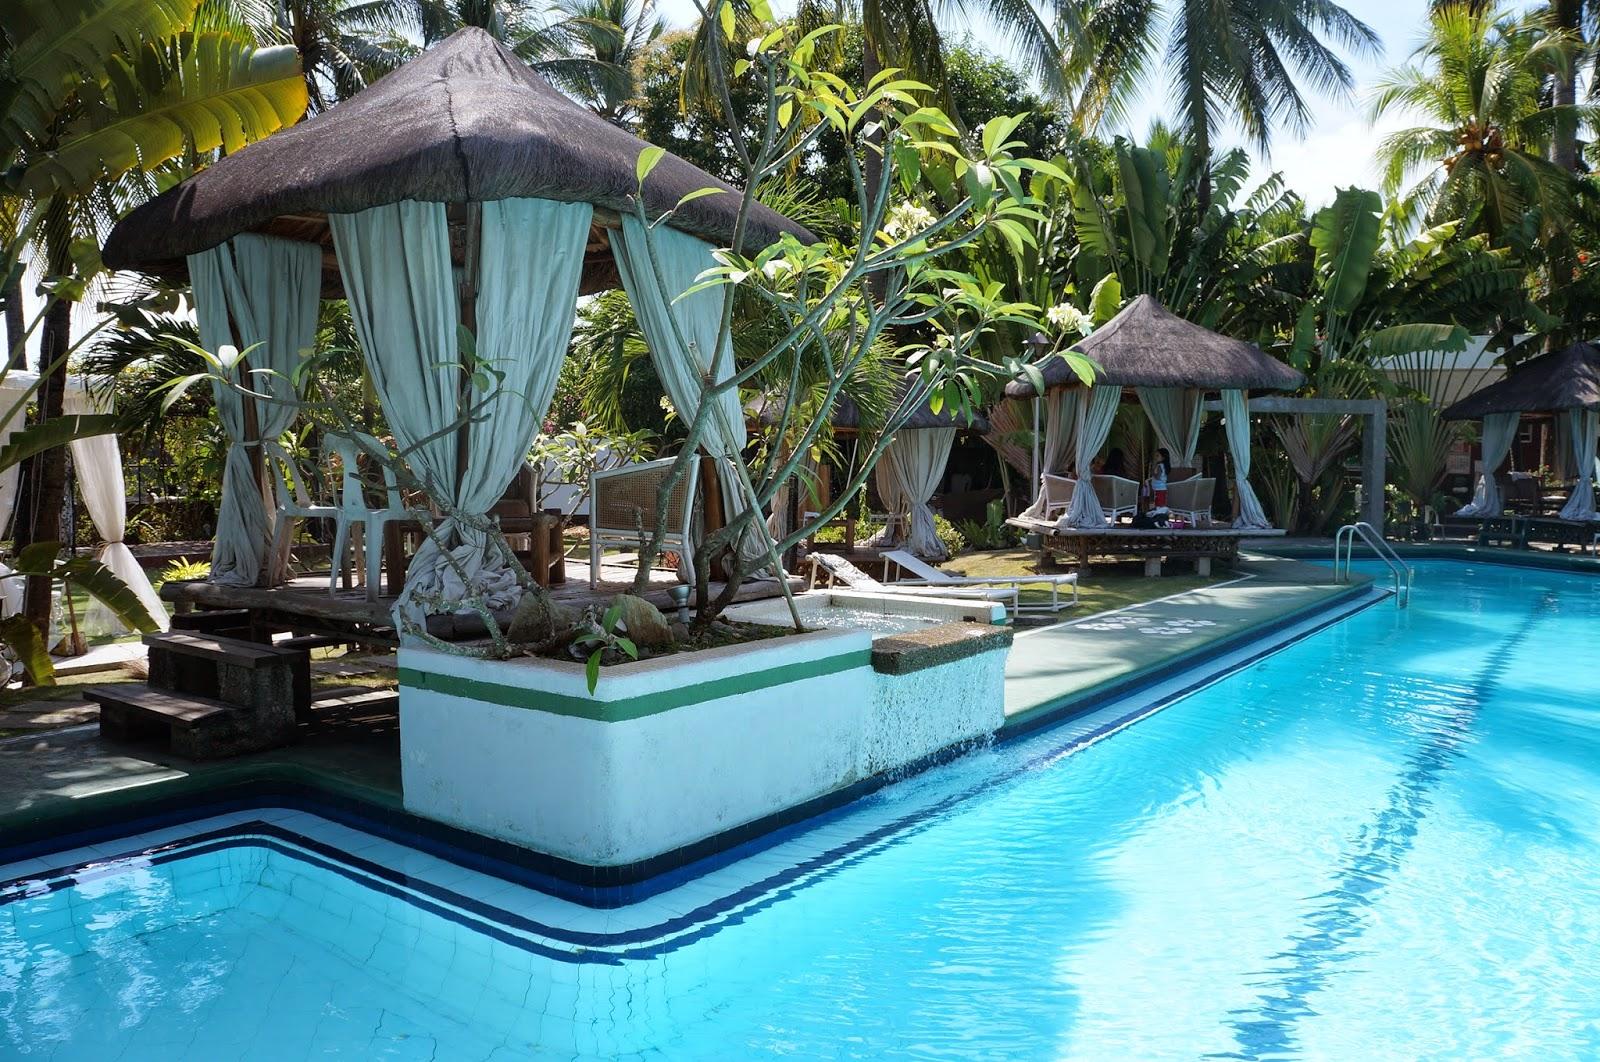 Zamboanga Adventure Exploring Asia 39 S Latin City Lantaka Hotel By The Sea Wazzup Pilipinas